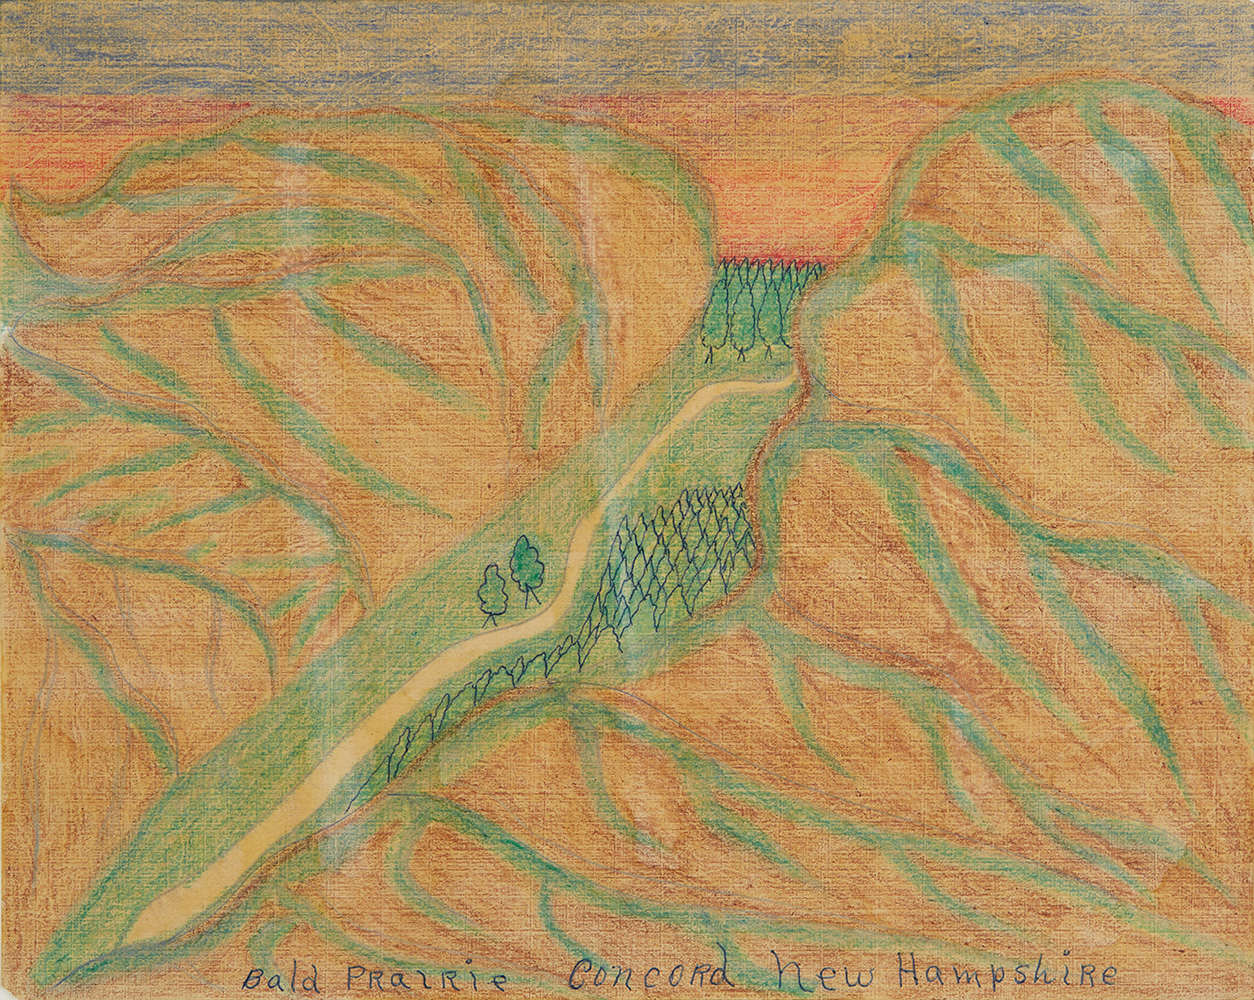 Joseph Yoakum  Bold Prairie, Concord, New Hampshire  , n.d. Colored pencil, graphite on paper 8 x 10 inches 20.3 x 25.4 cm JY 57